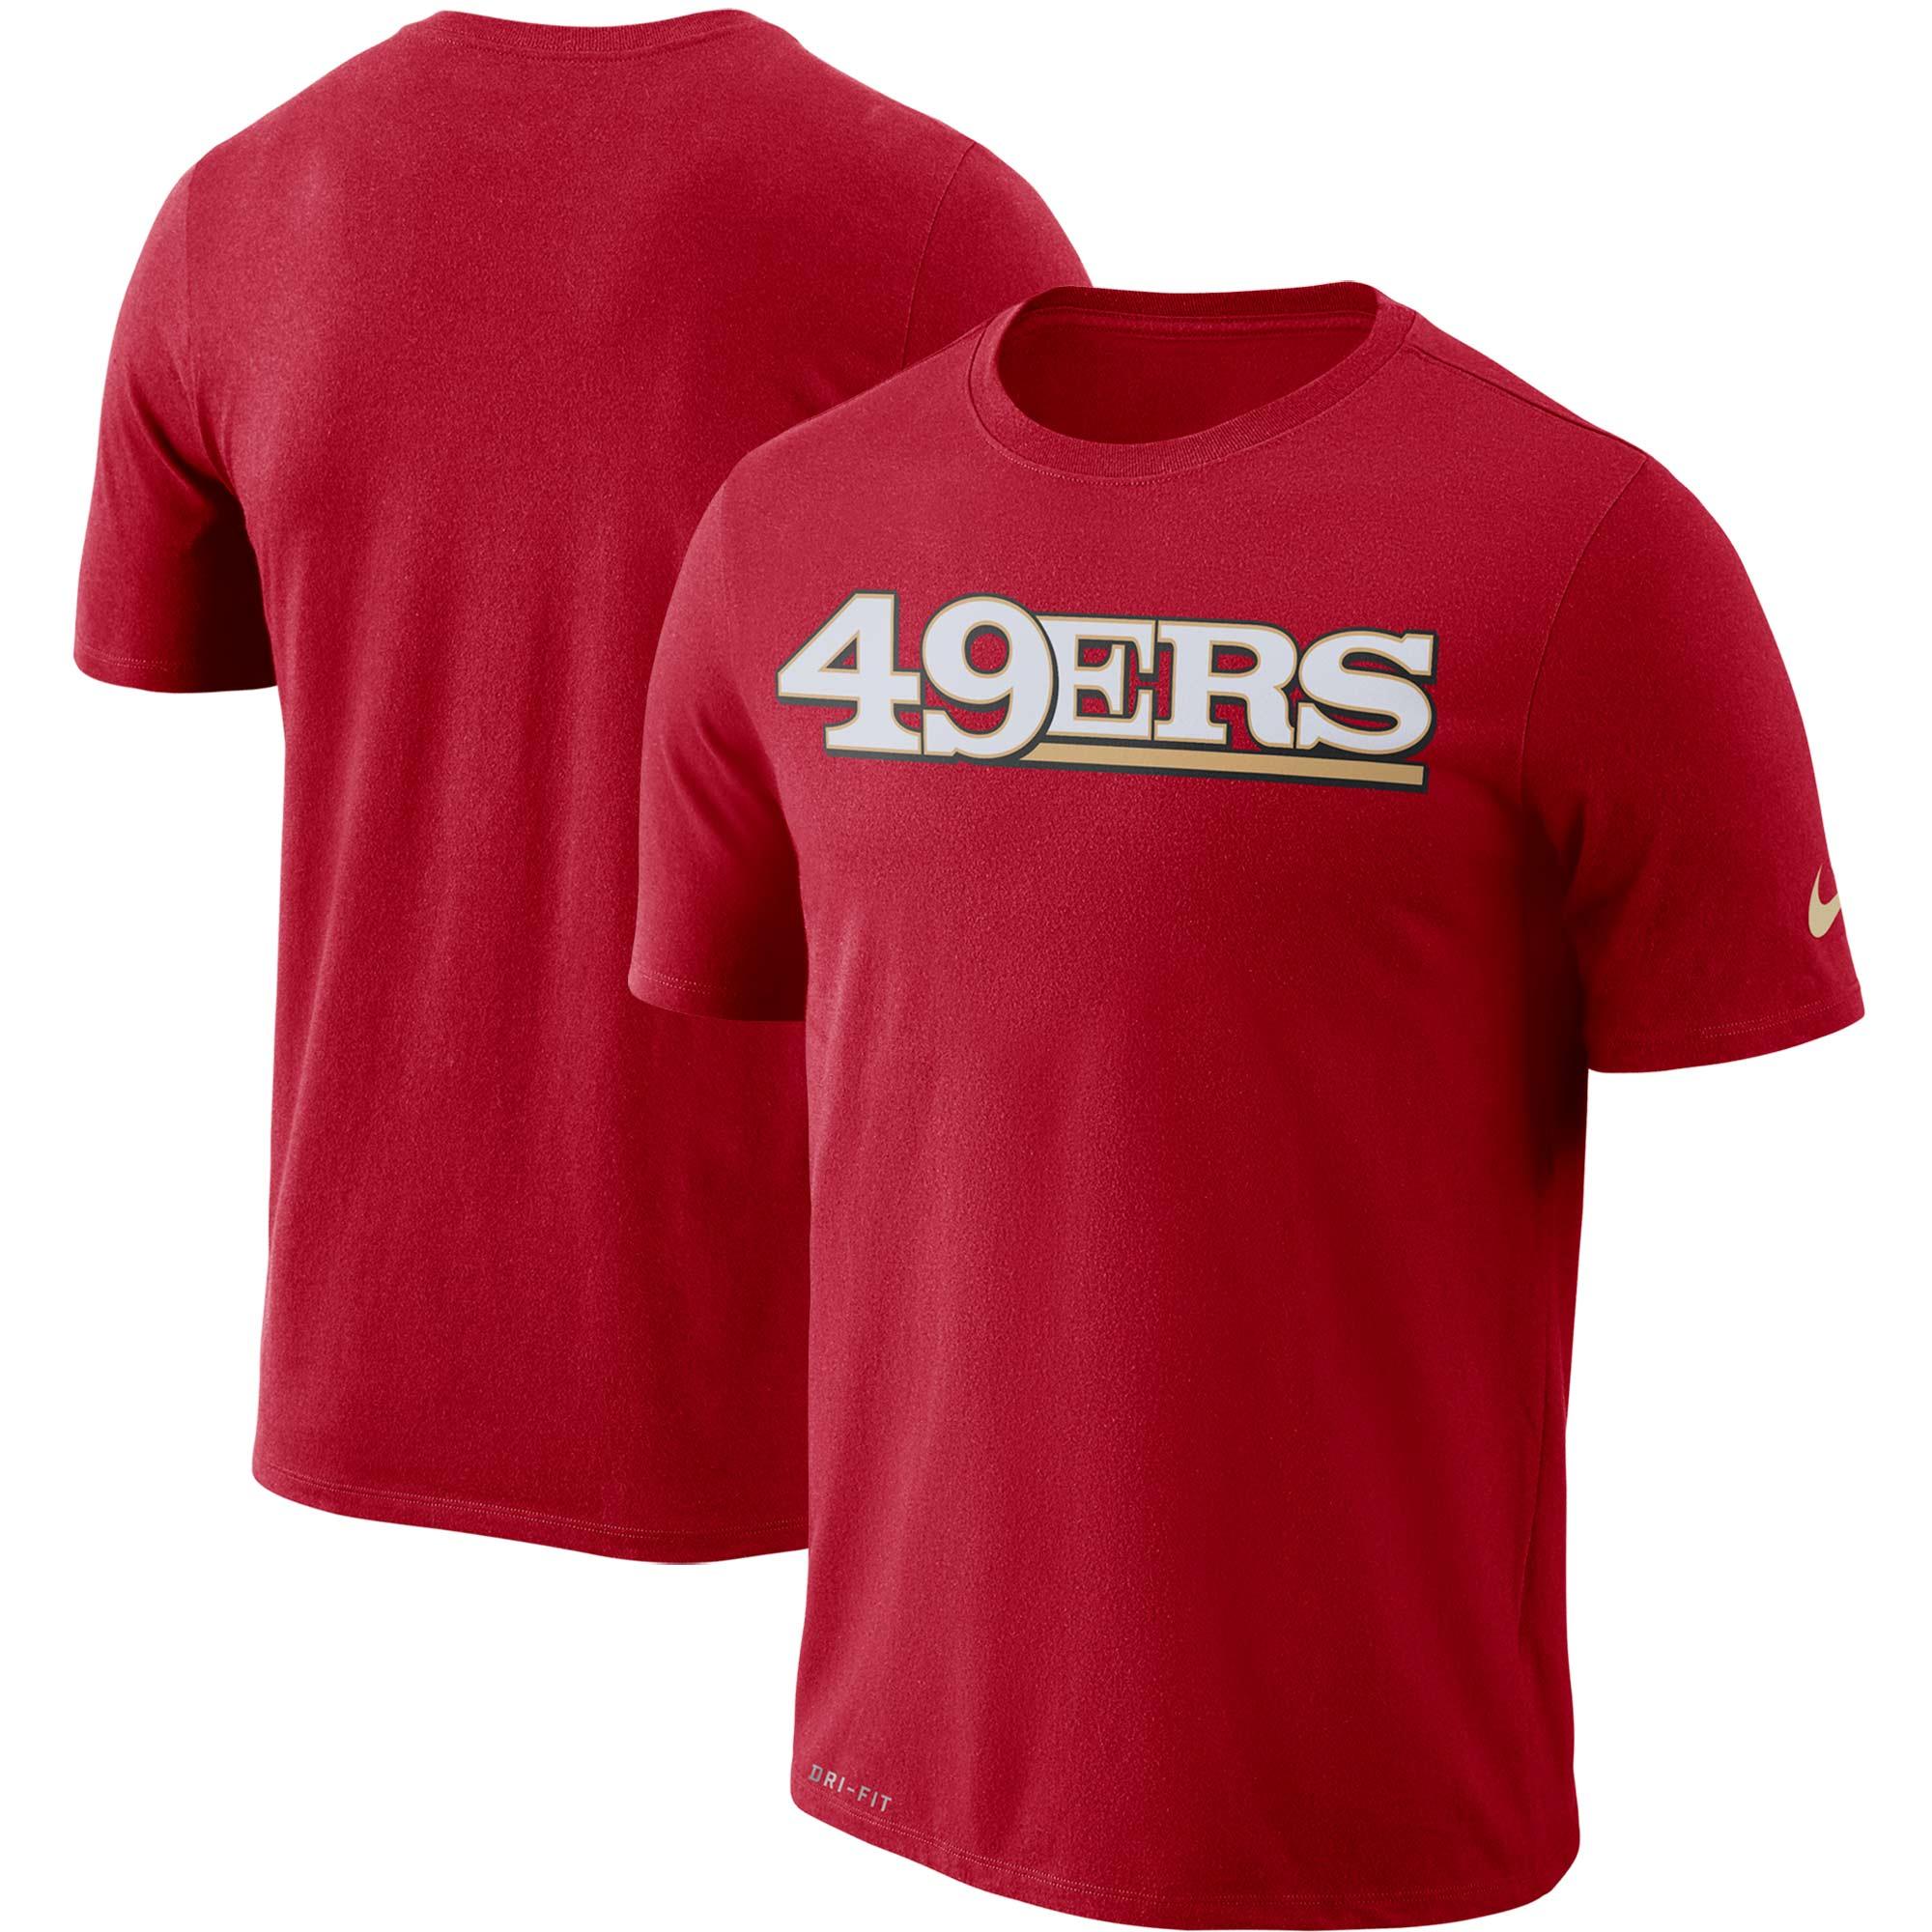 San Francisco 49ers Nike Dri-FIT Cotton Essential Wordmark T-Shirt - Scarlet